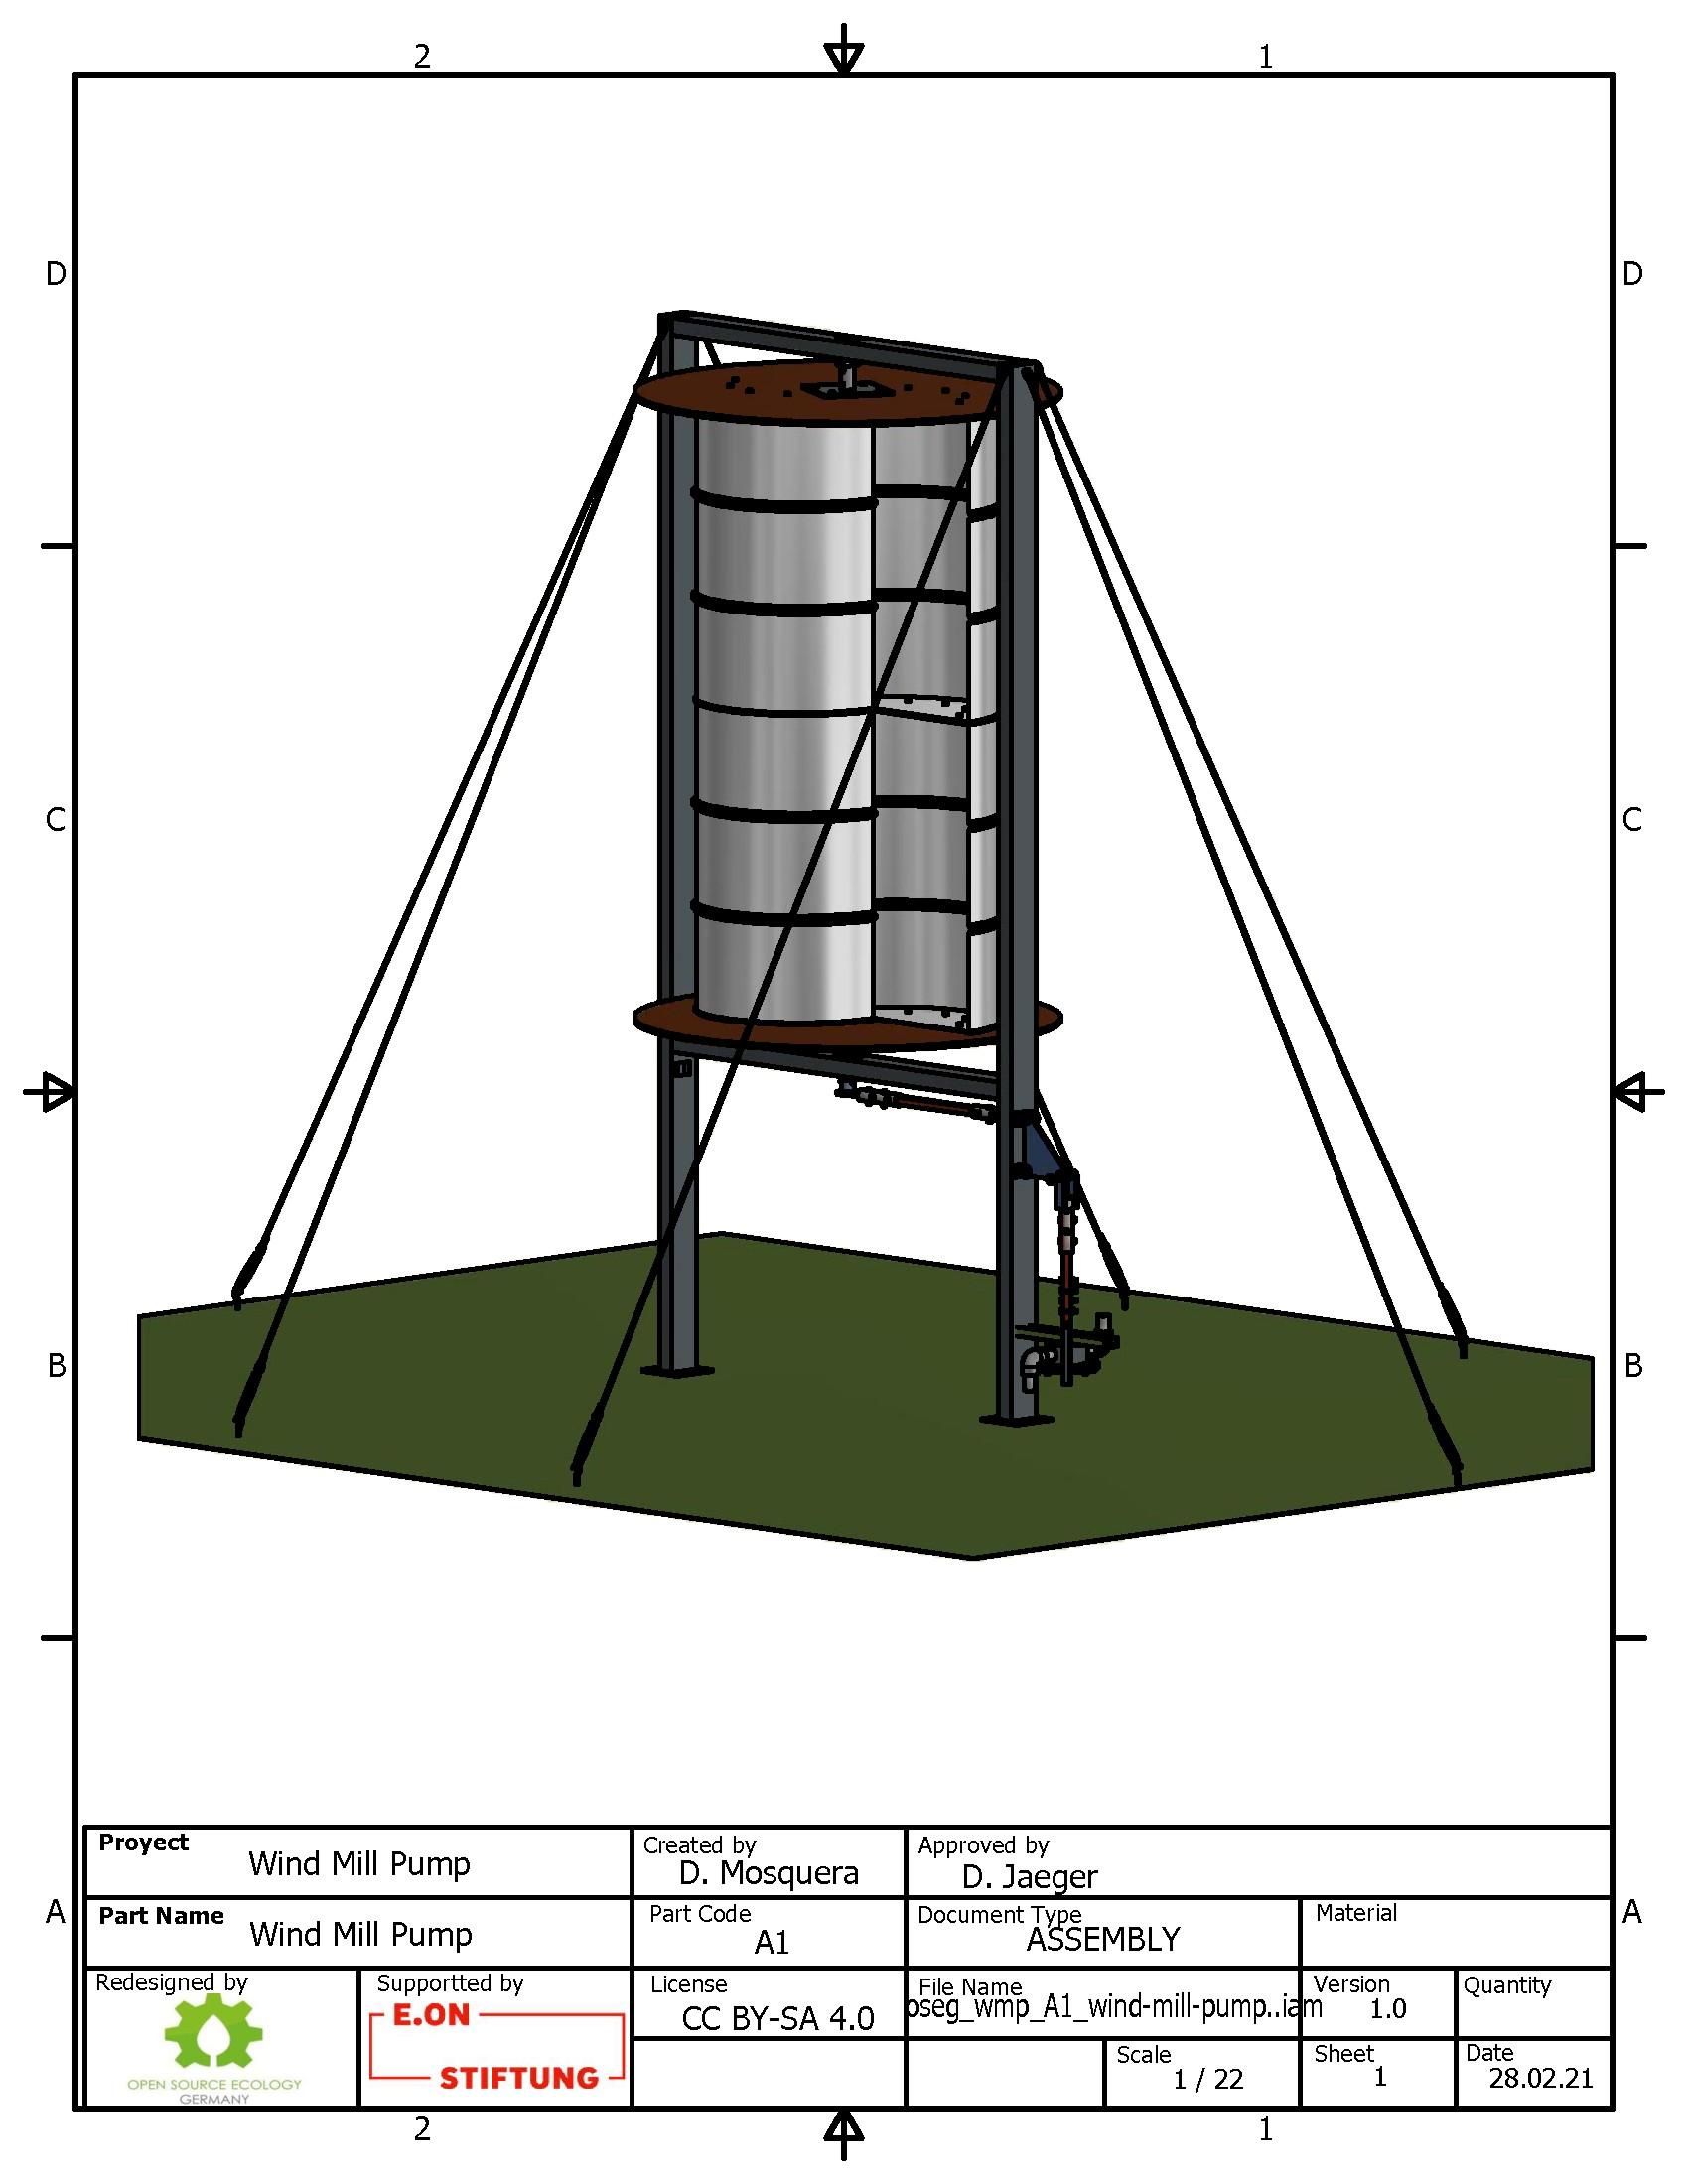 Oseg wmp A1 Wind Mill Pump 001.jpg